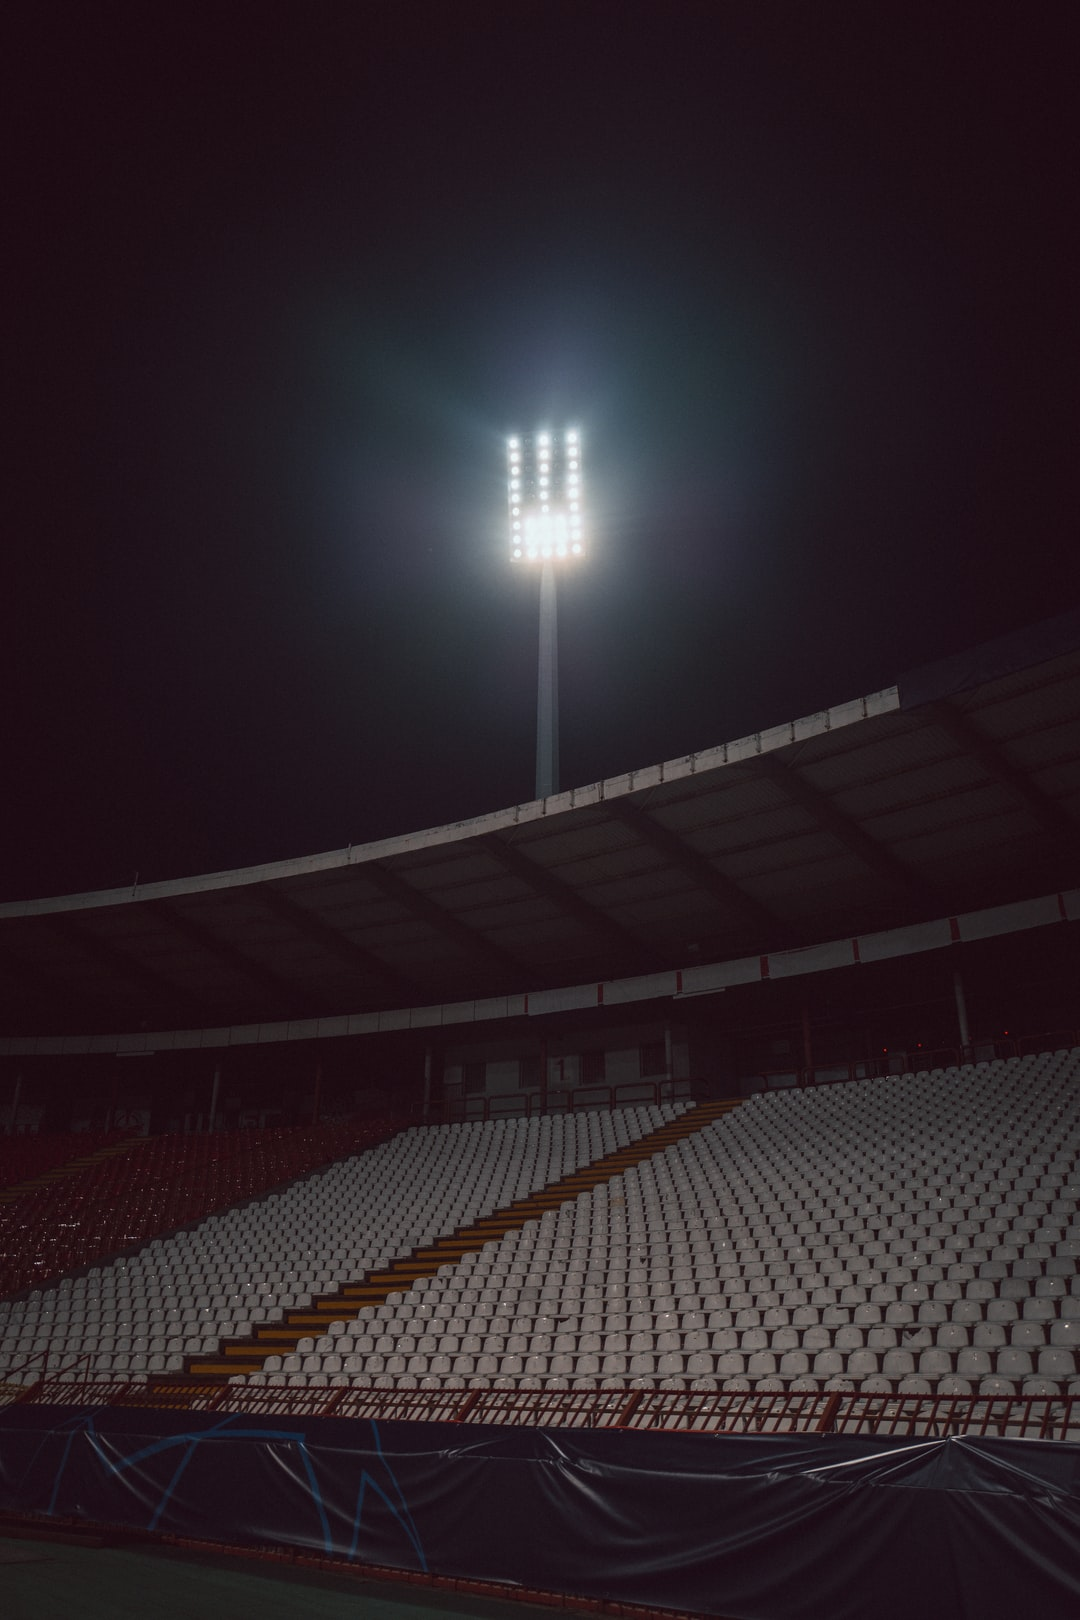 Stadium floodlights at the Rajko Mitić Stadium in Belgrade